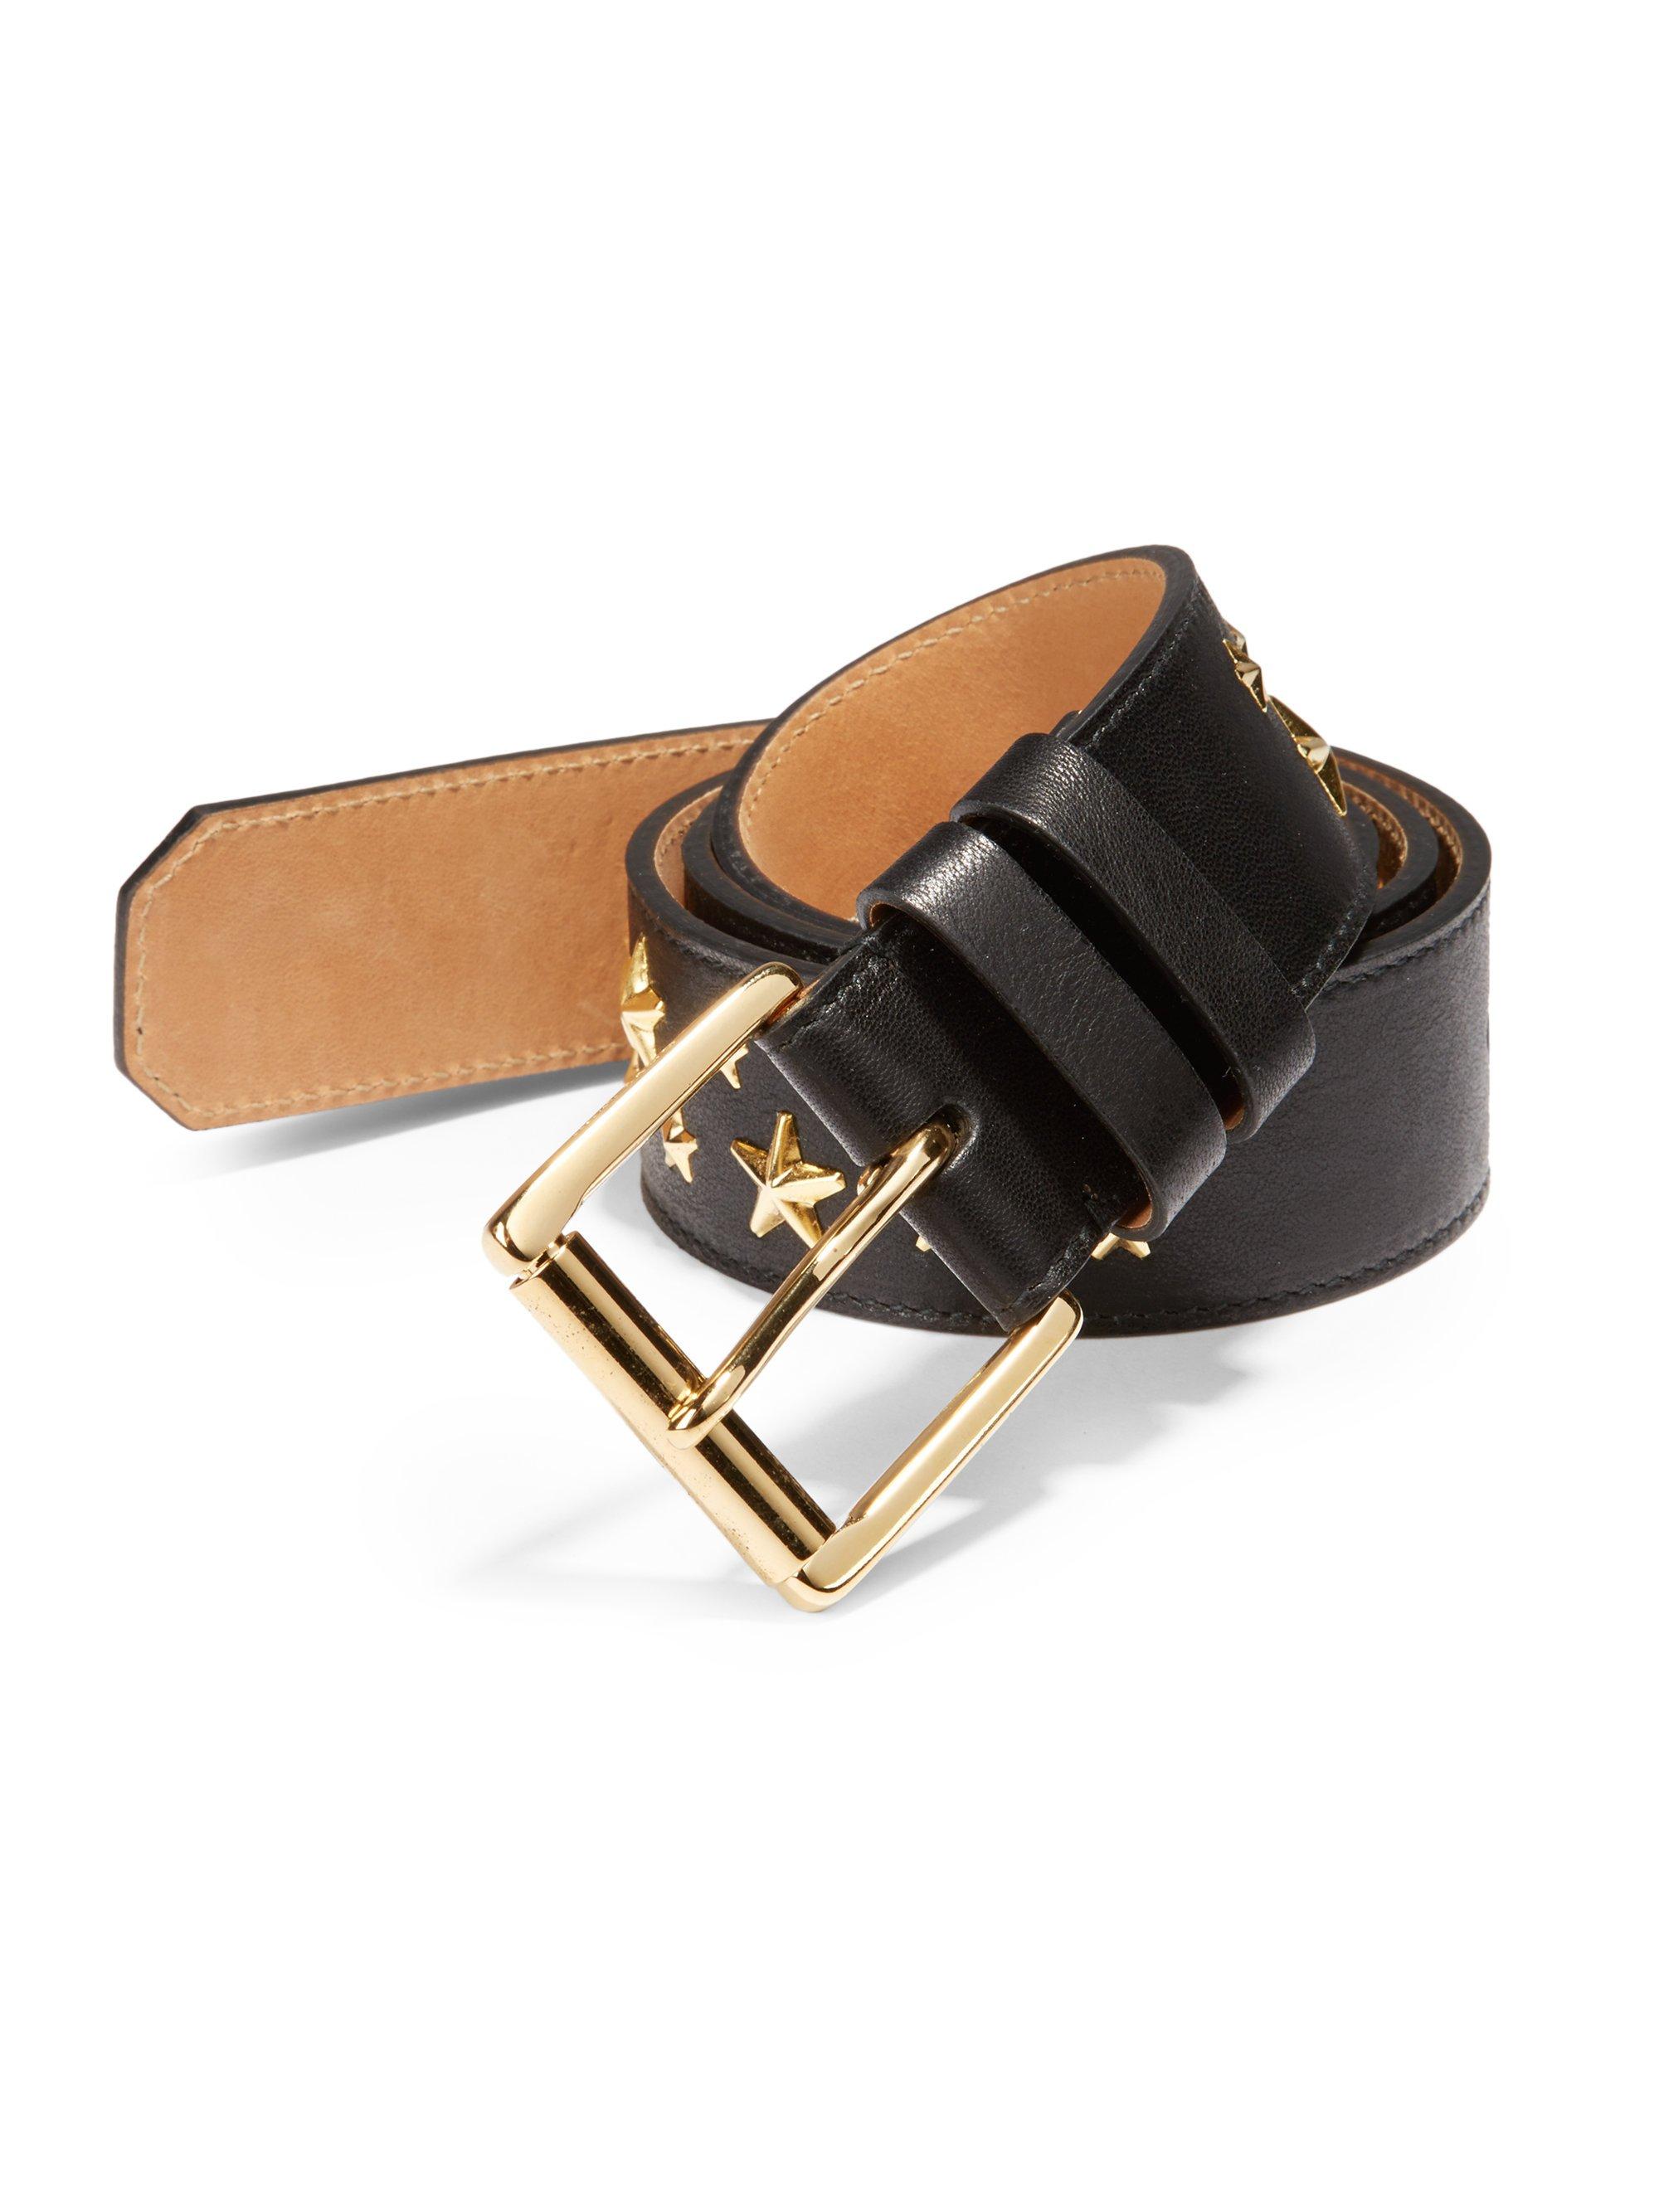 jimmy choo archer biker studded leather belt in black